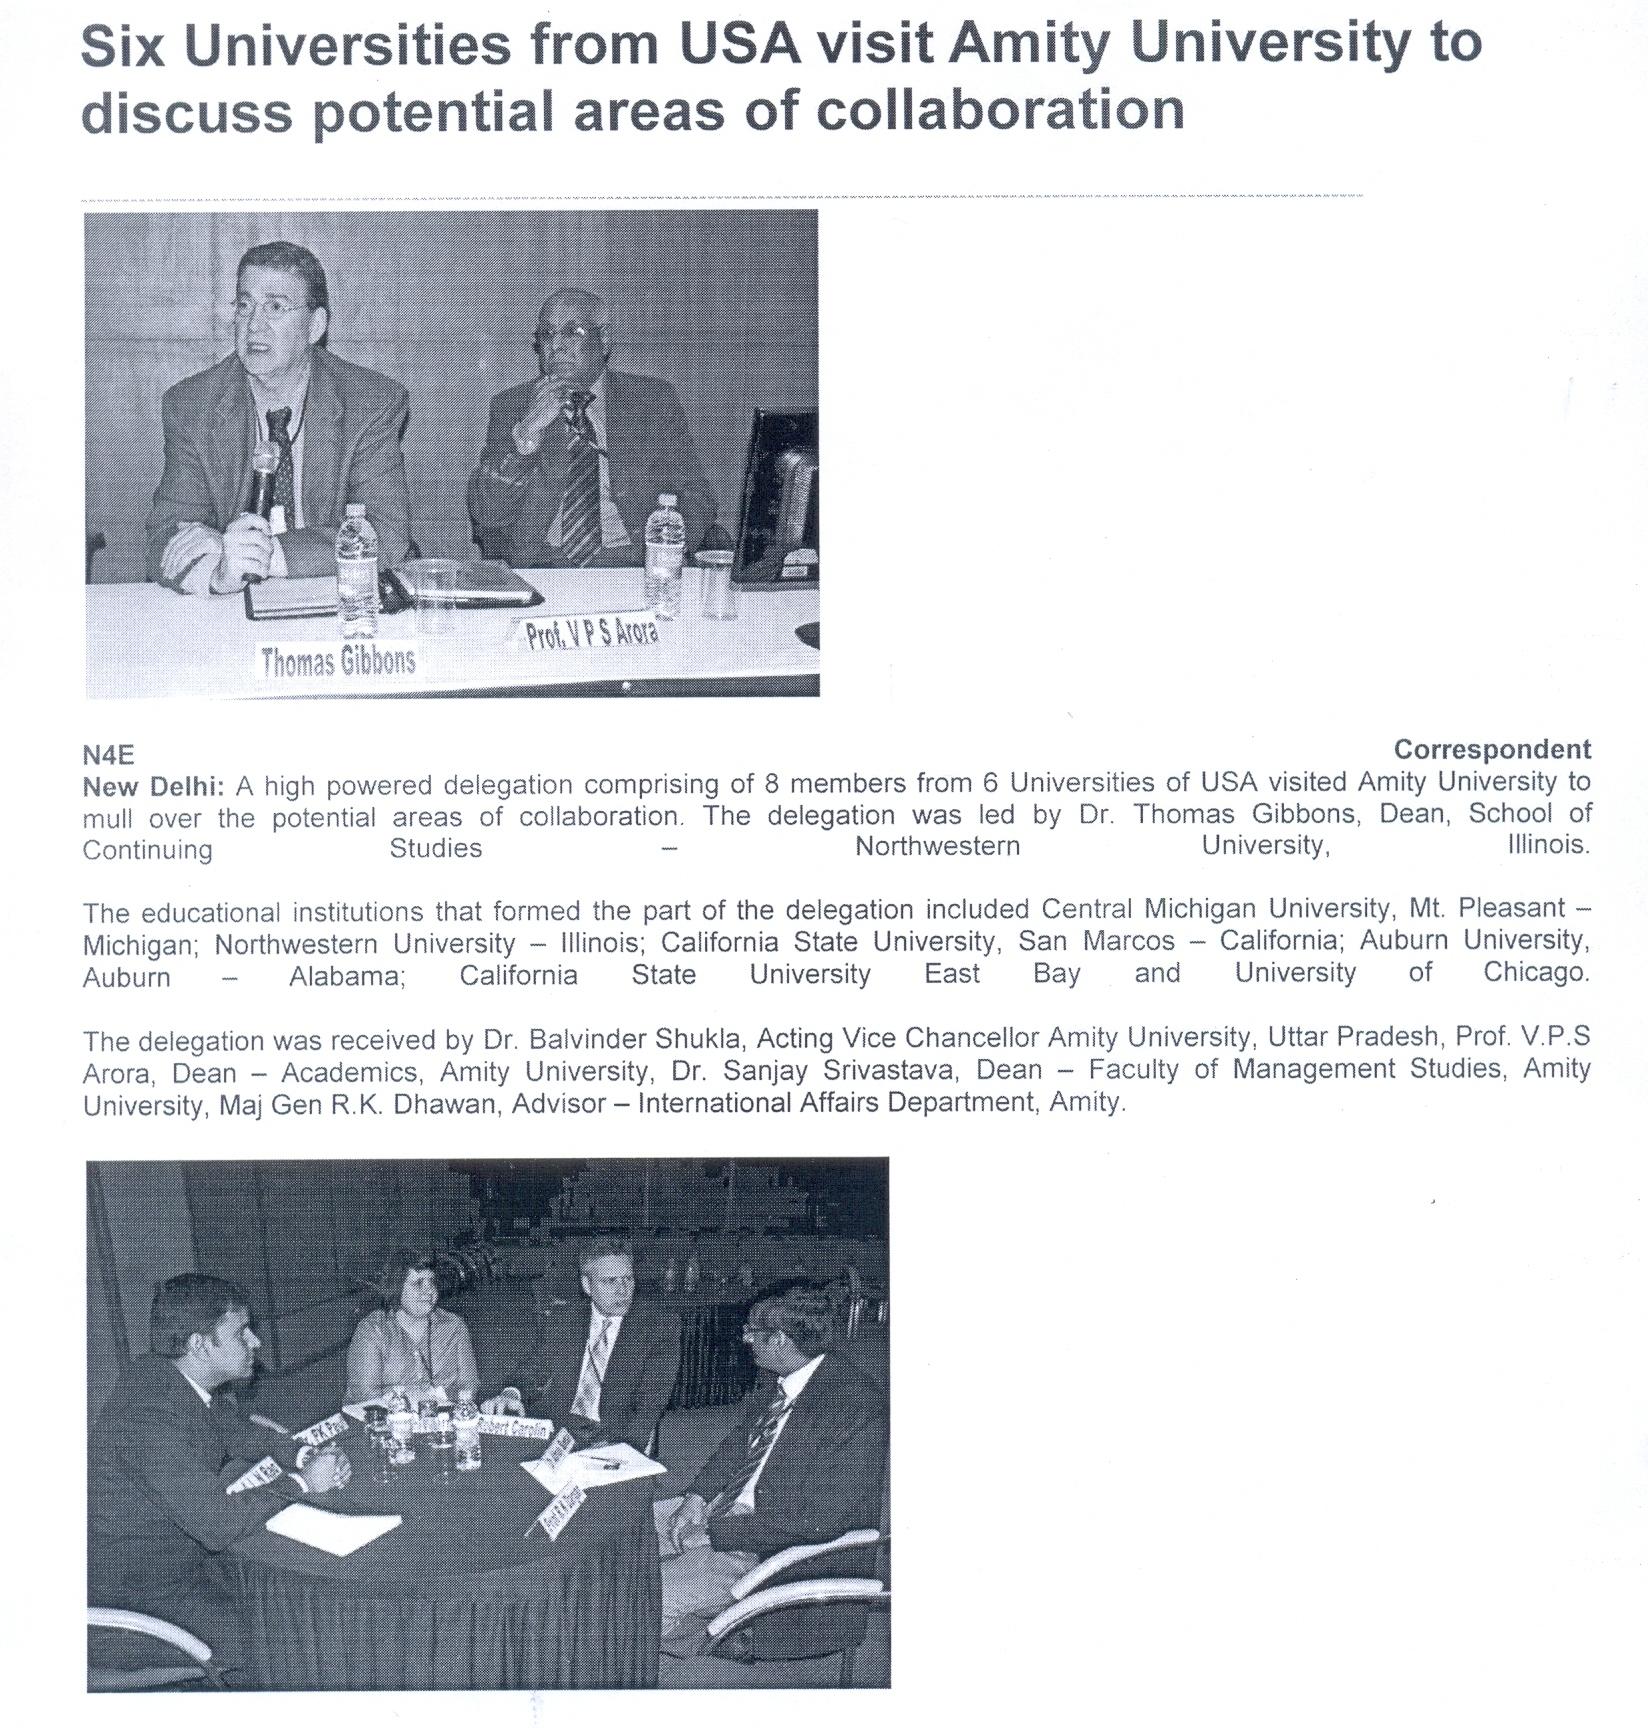 Delegation from Six Universities USA visits Amity University